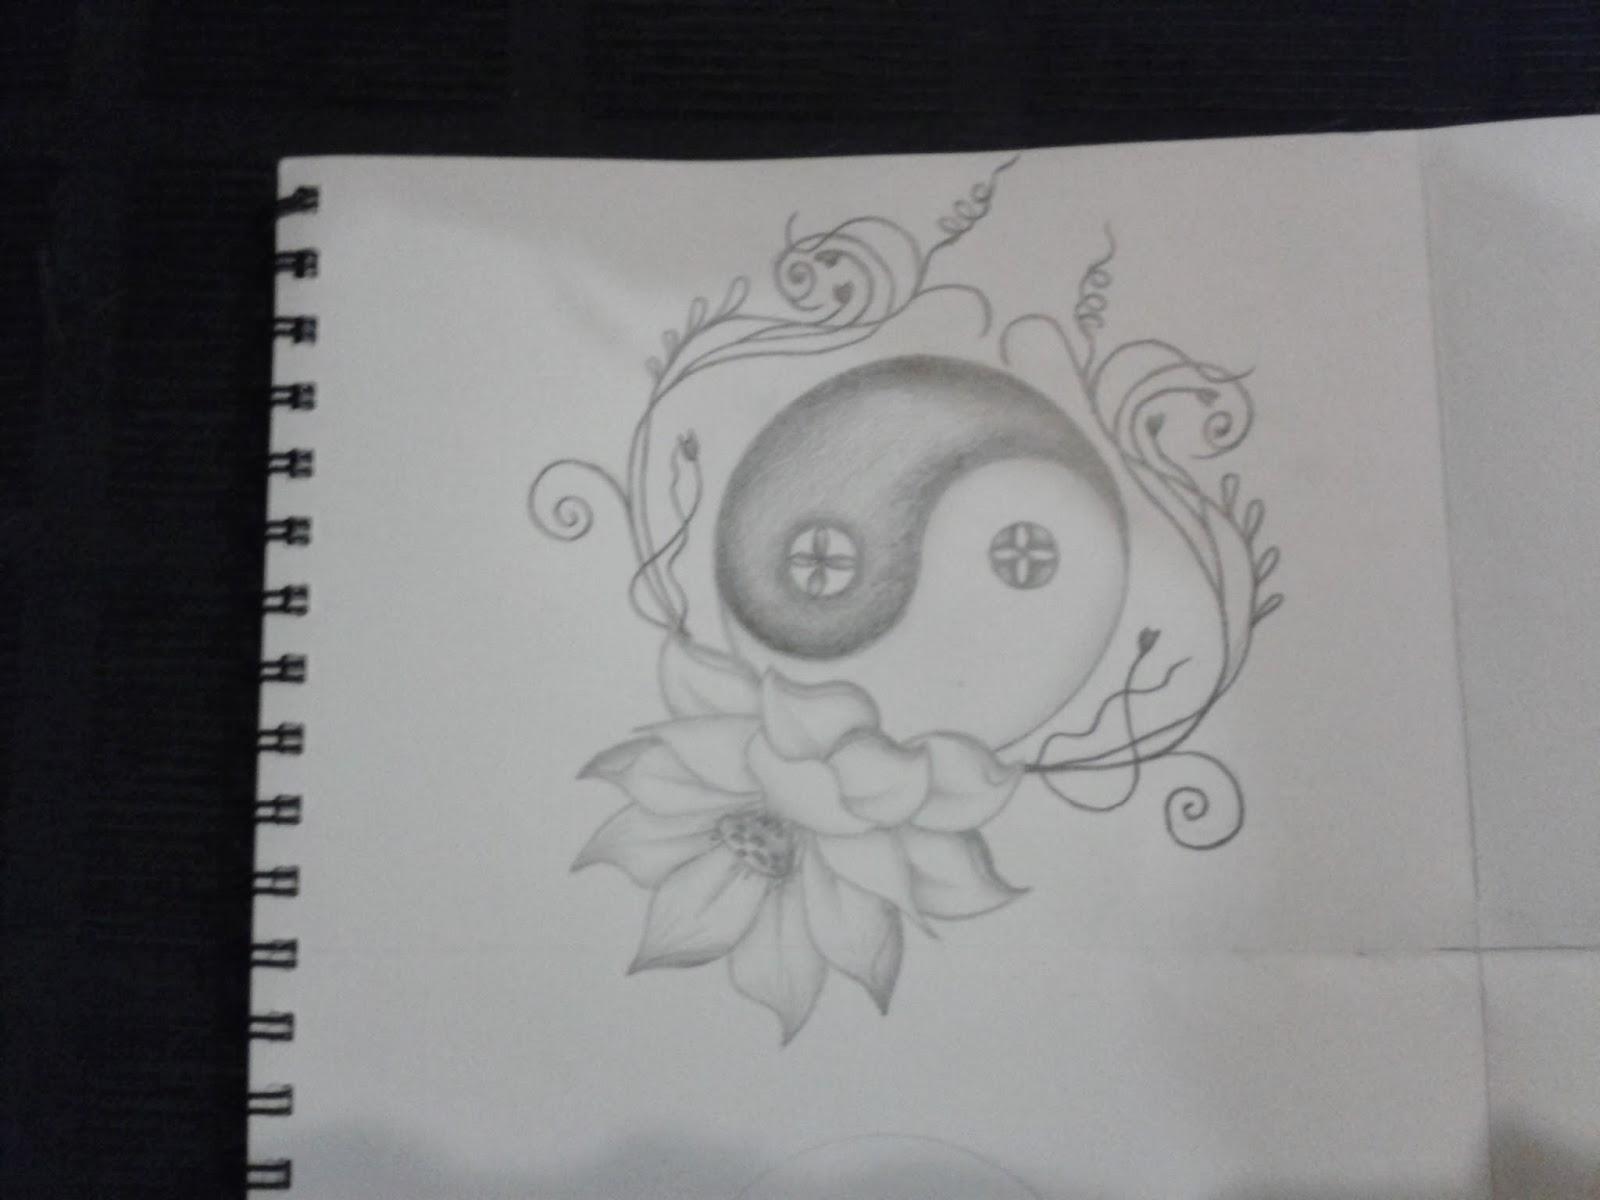 R3dwall Art Lotus Floweryin Yang Tattoo Design